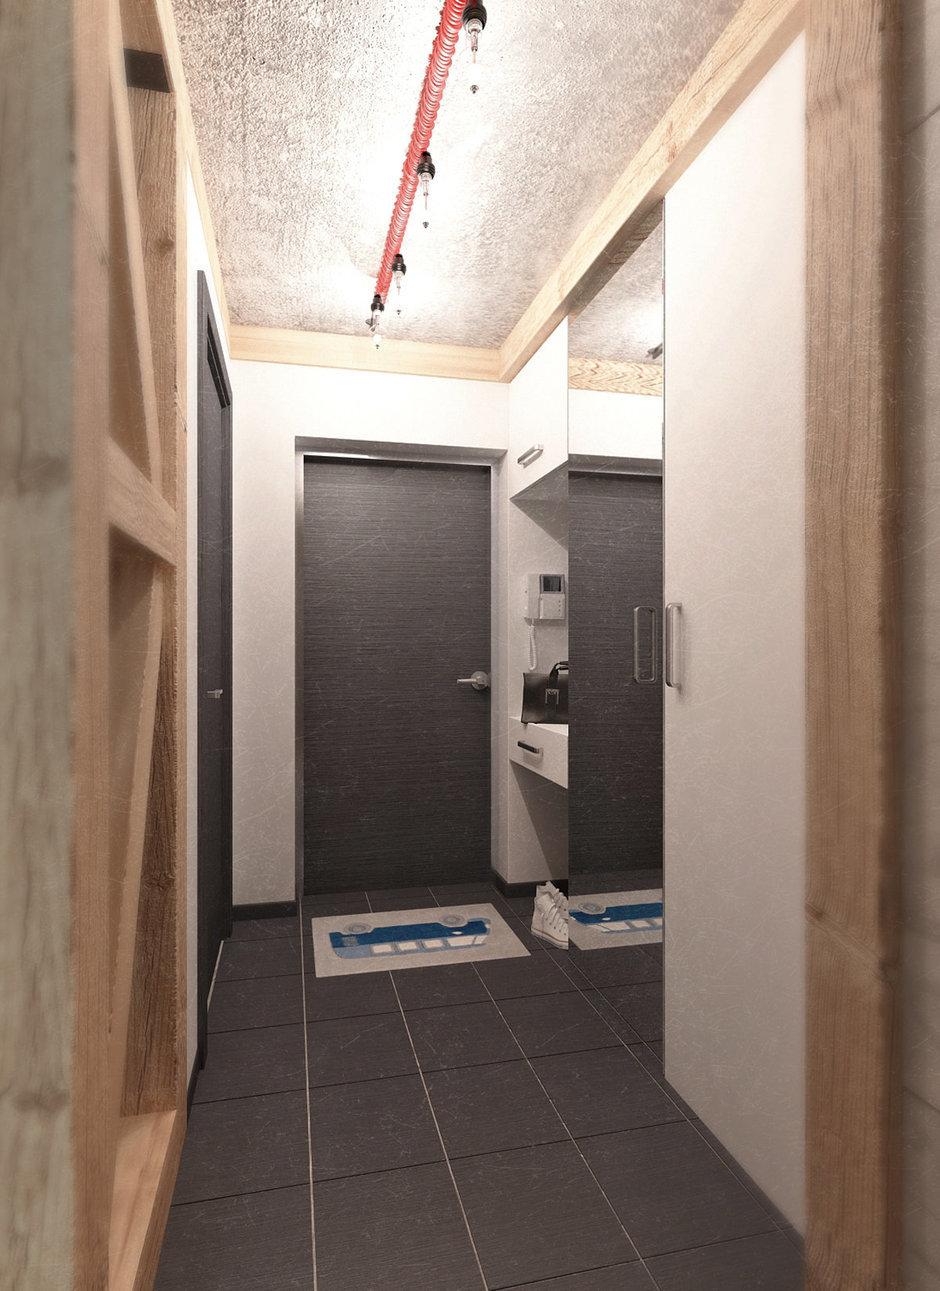 Фотография: Прихожая в стиле Лофт, Квартира, Дома и квартиры, IKEA, Проект недели, Cosmorelax – фото на InMyRoom.ru